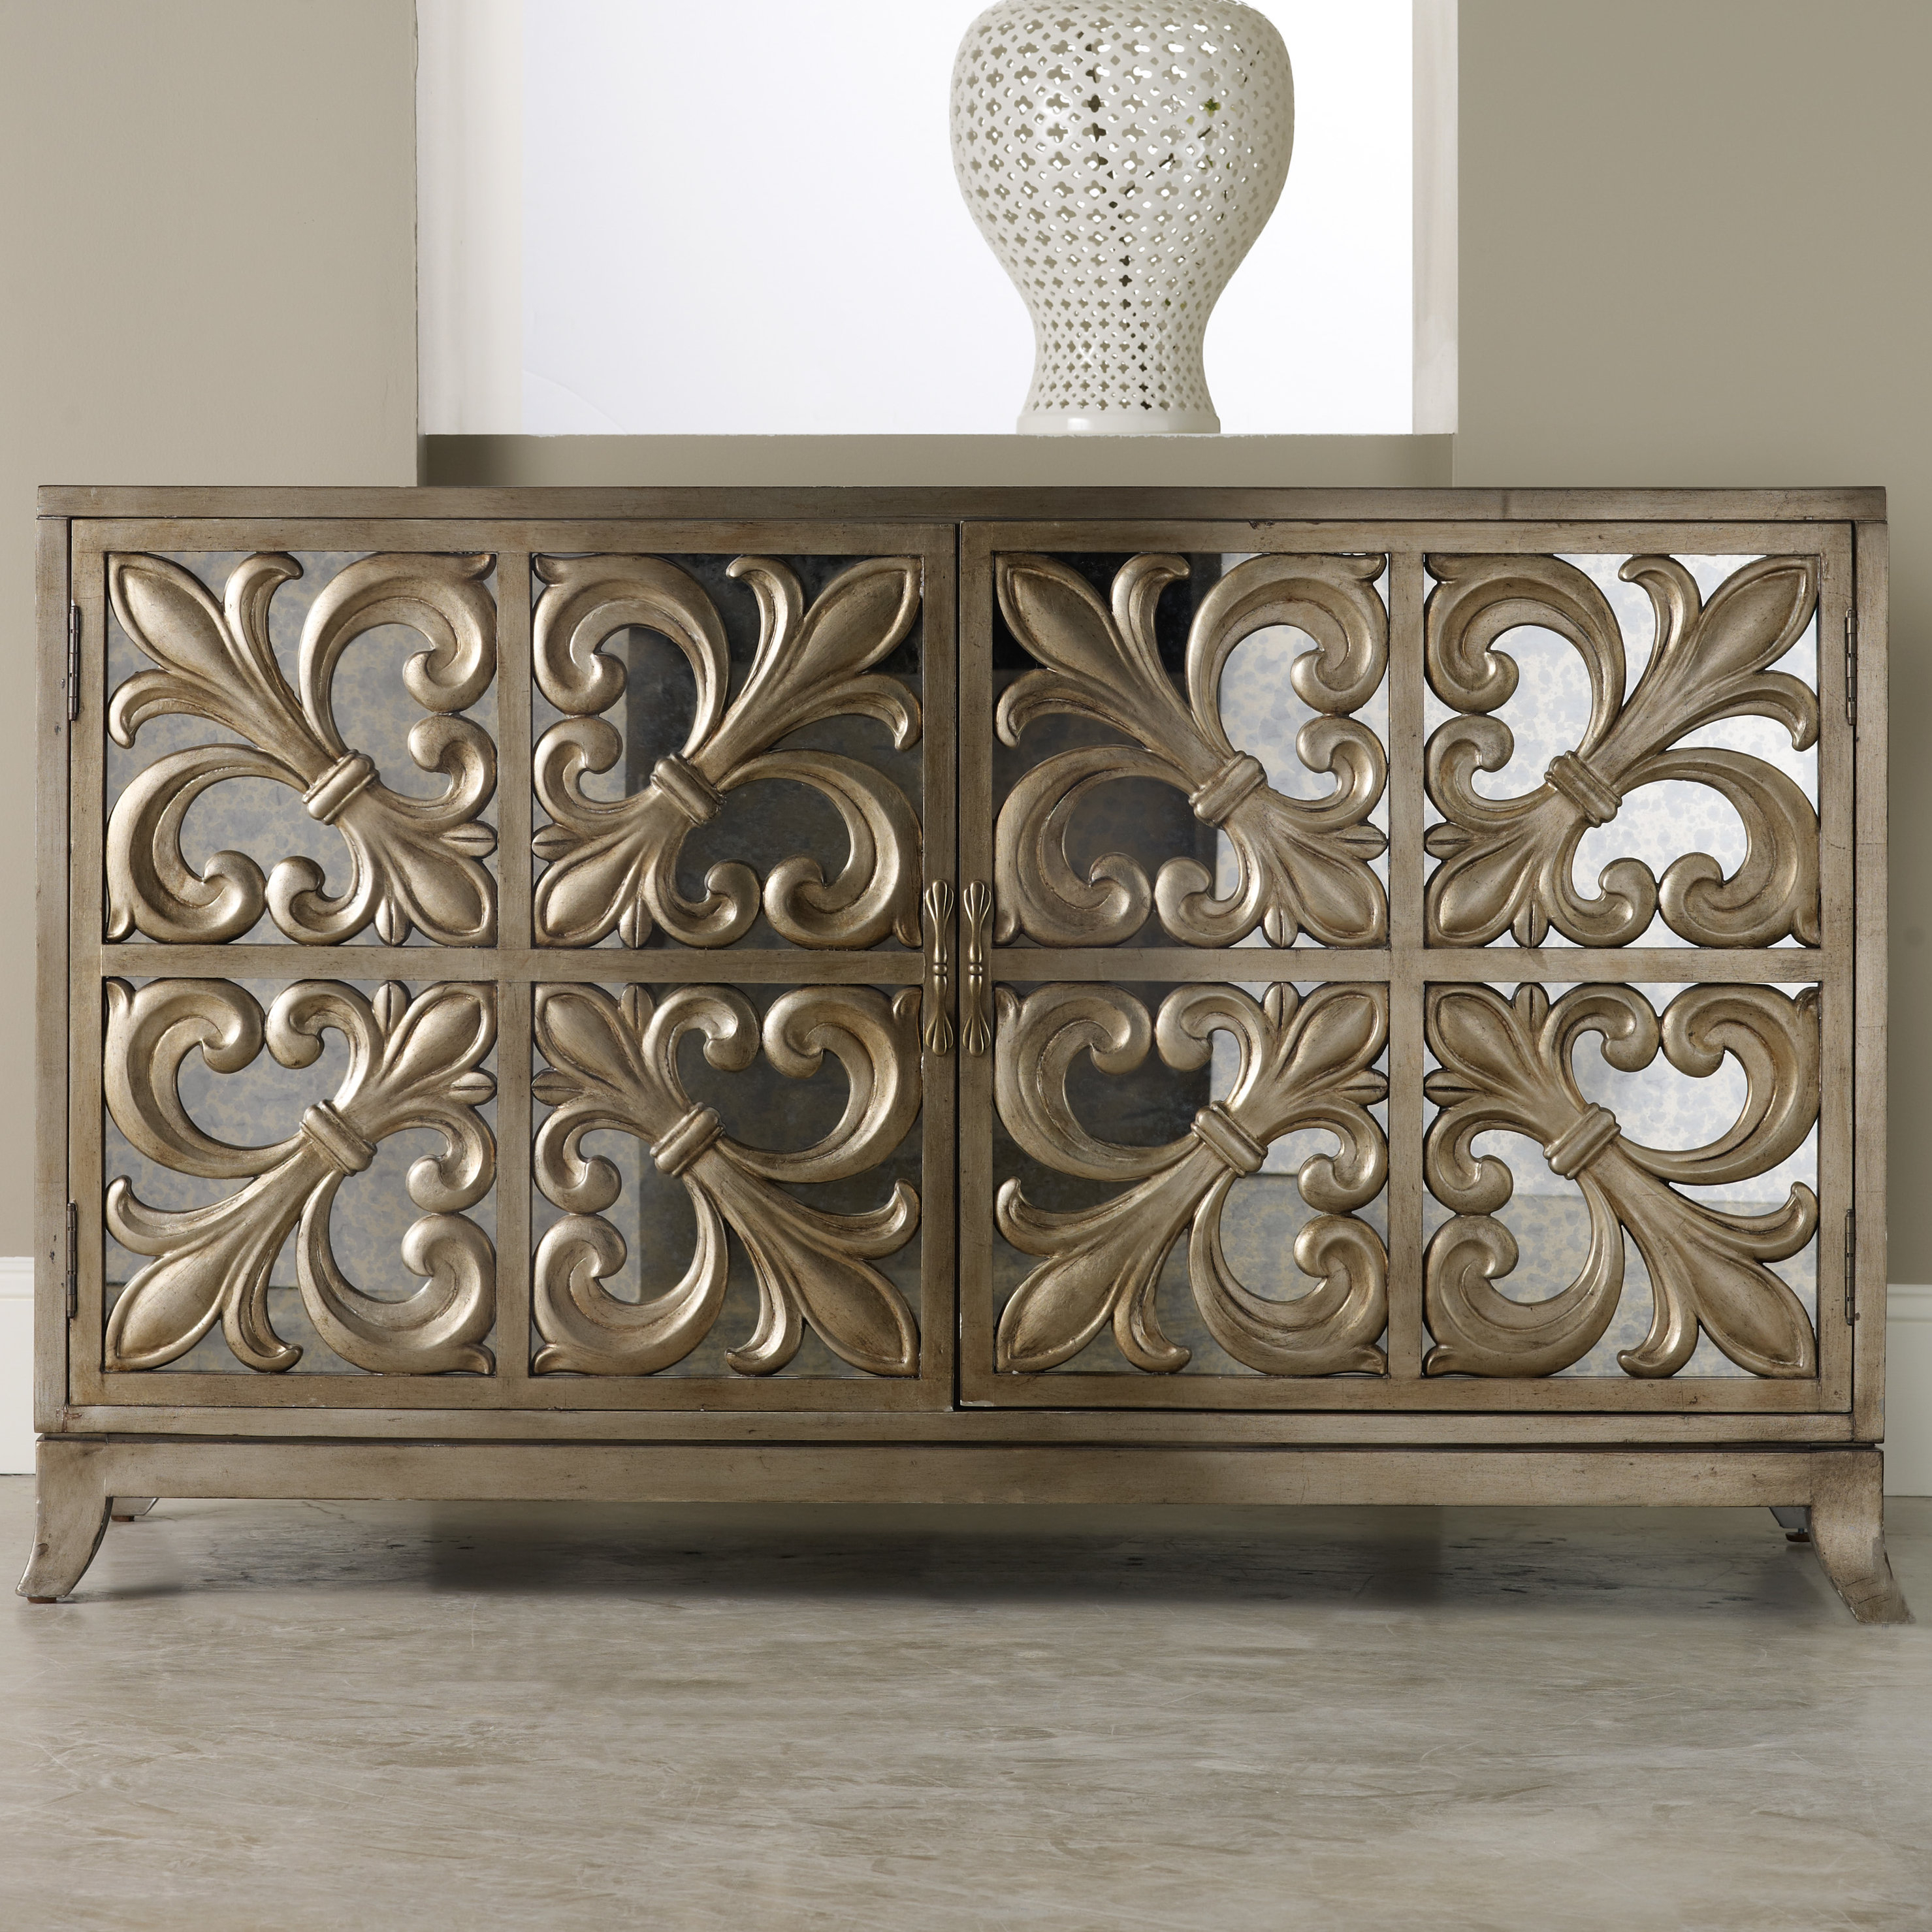 Hooker Furniture Melange Fleur-De-Lis Mirrored Sideboard inside Alkmene Sideboards (Image 13 of 30)